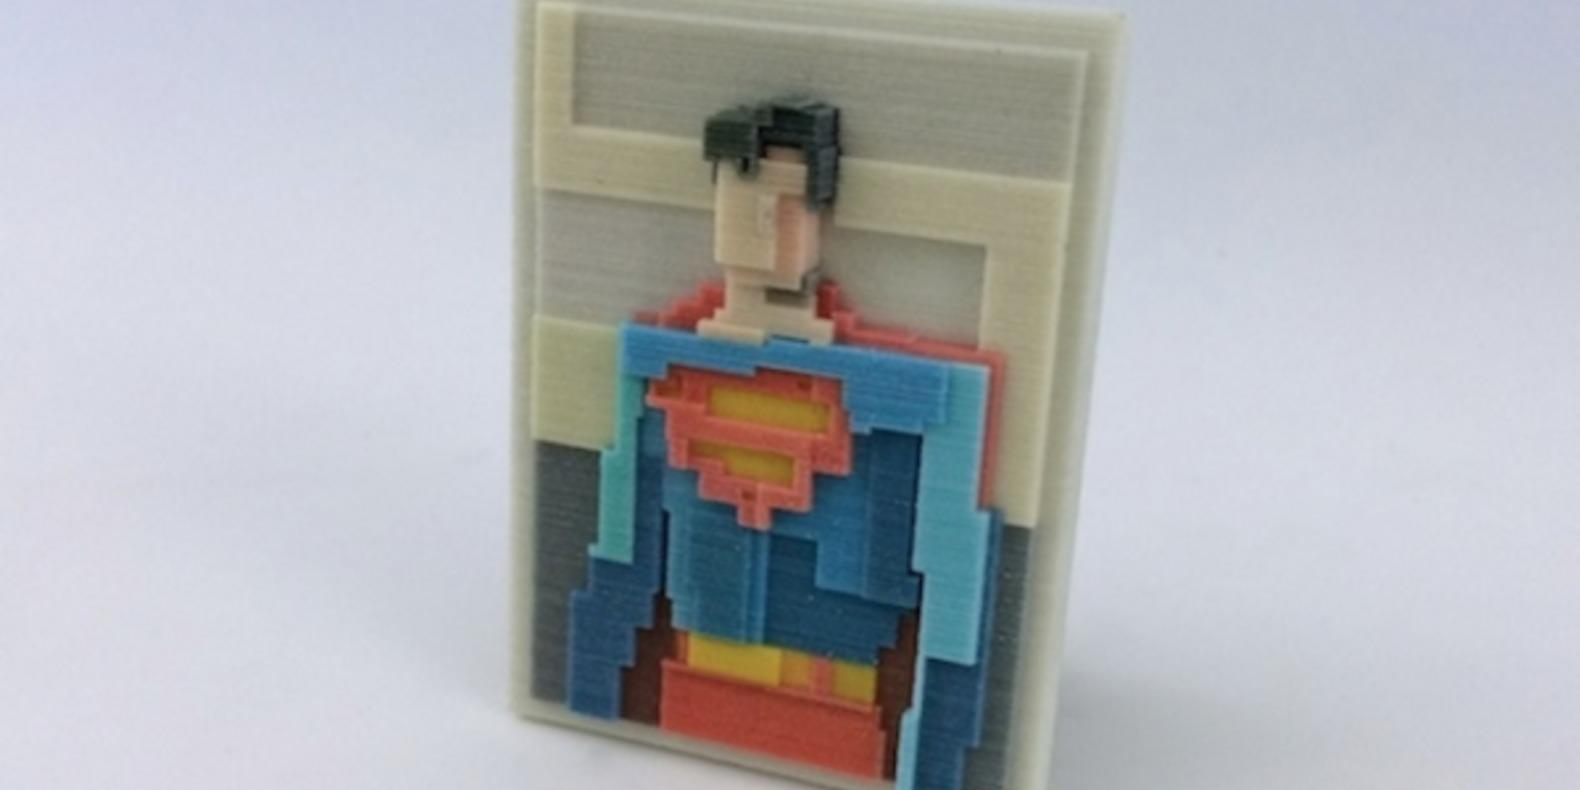 adam lister isaac budmen 8 Bits, 3 Dimensions art 3D printing printed cults3D fichier 3D designer artist ETR breaking bad superman mona lisa